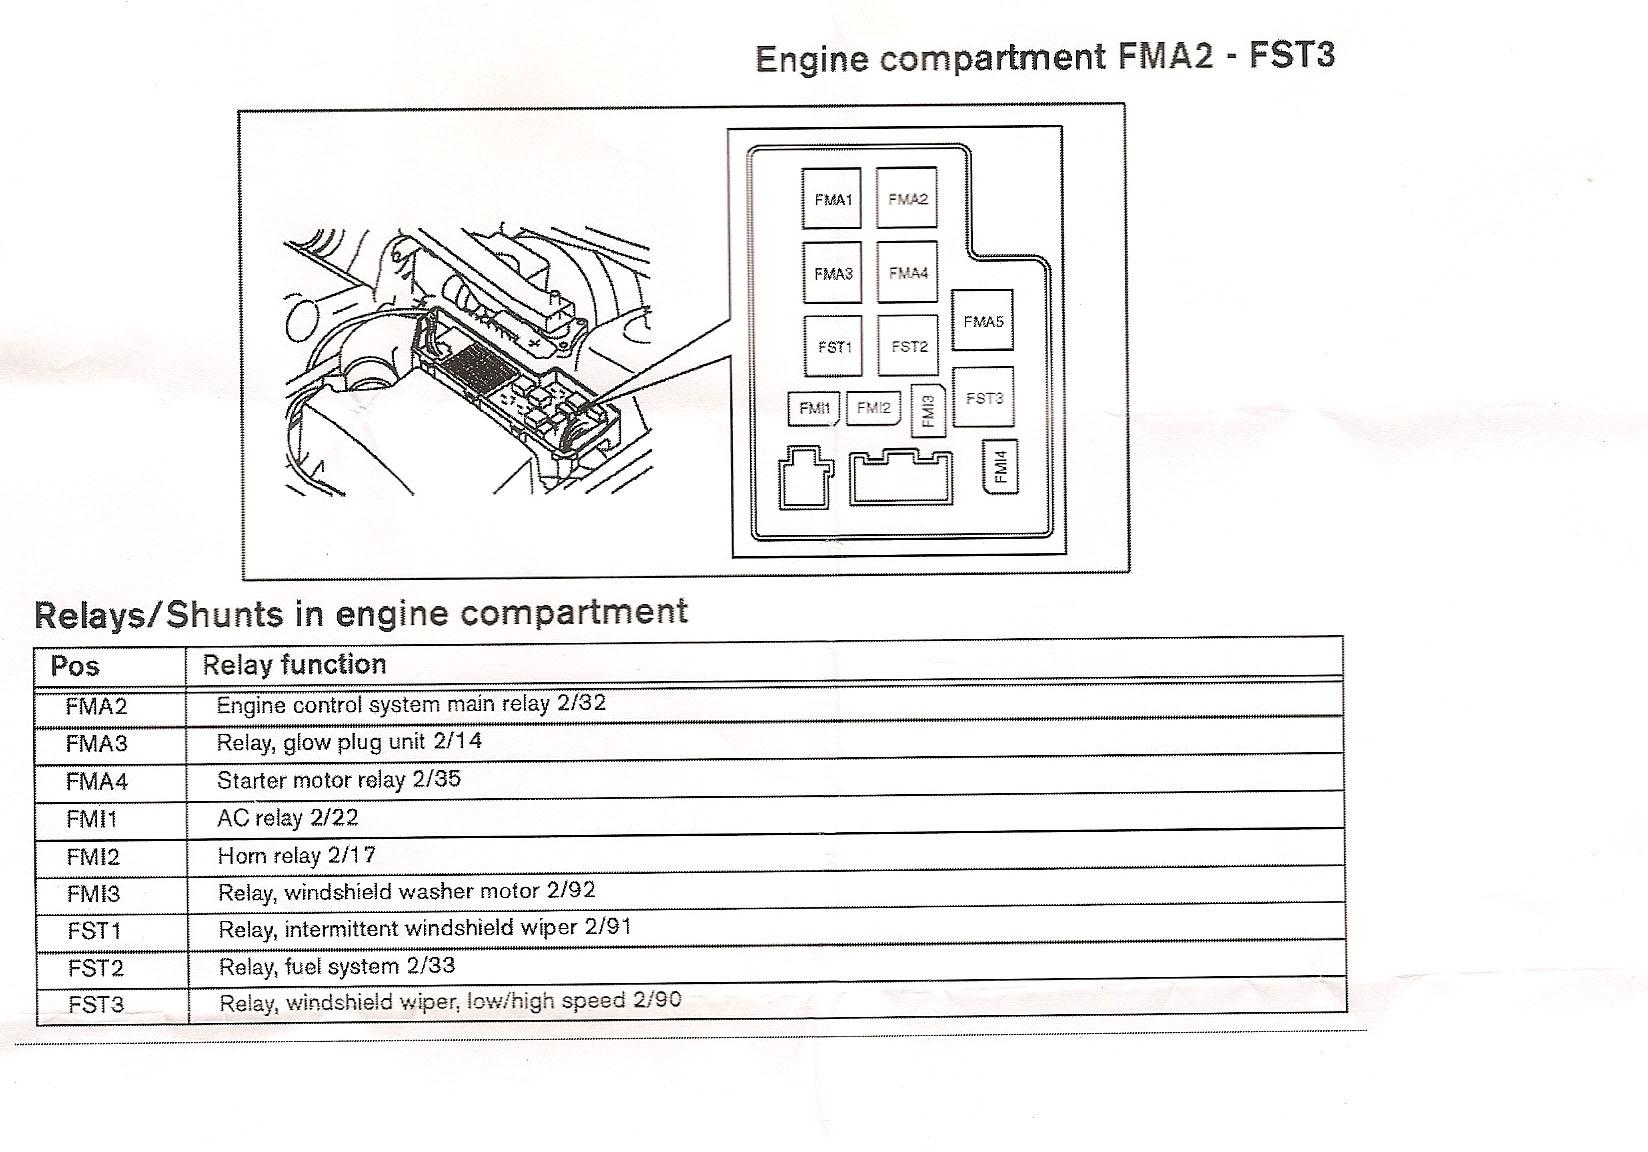 2004 Volvo Xc90 Fuse Diagram - Wiring Diagram Write on